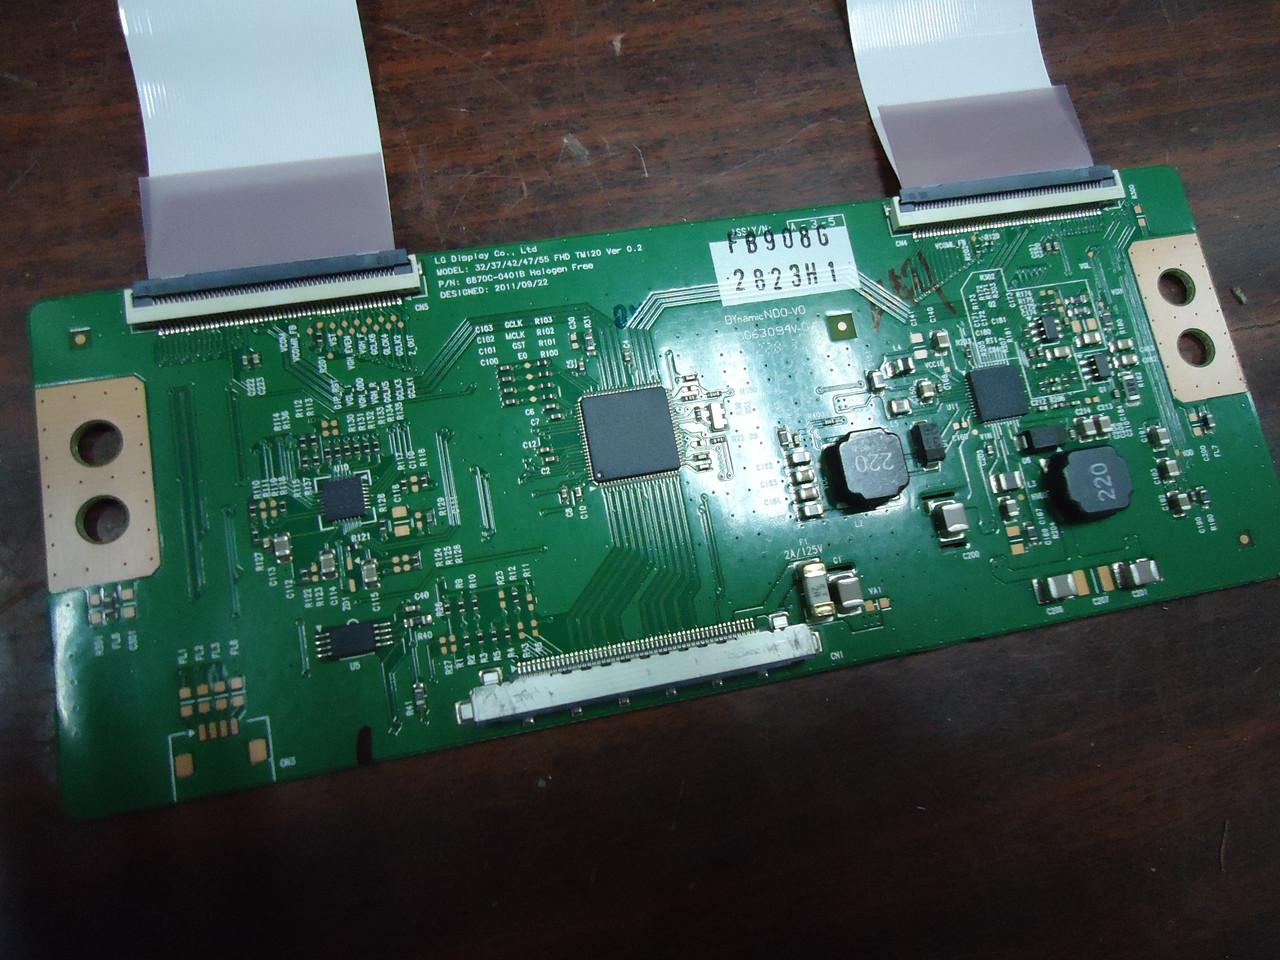 TCON 6870c-0401b Lg FHD TM120 VER 0.2